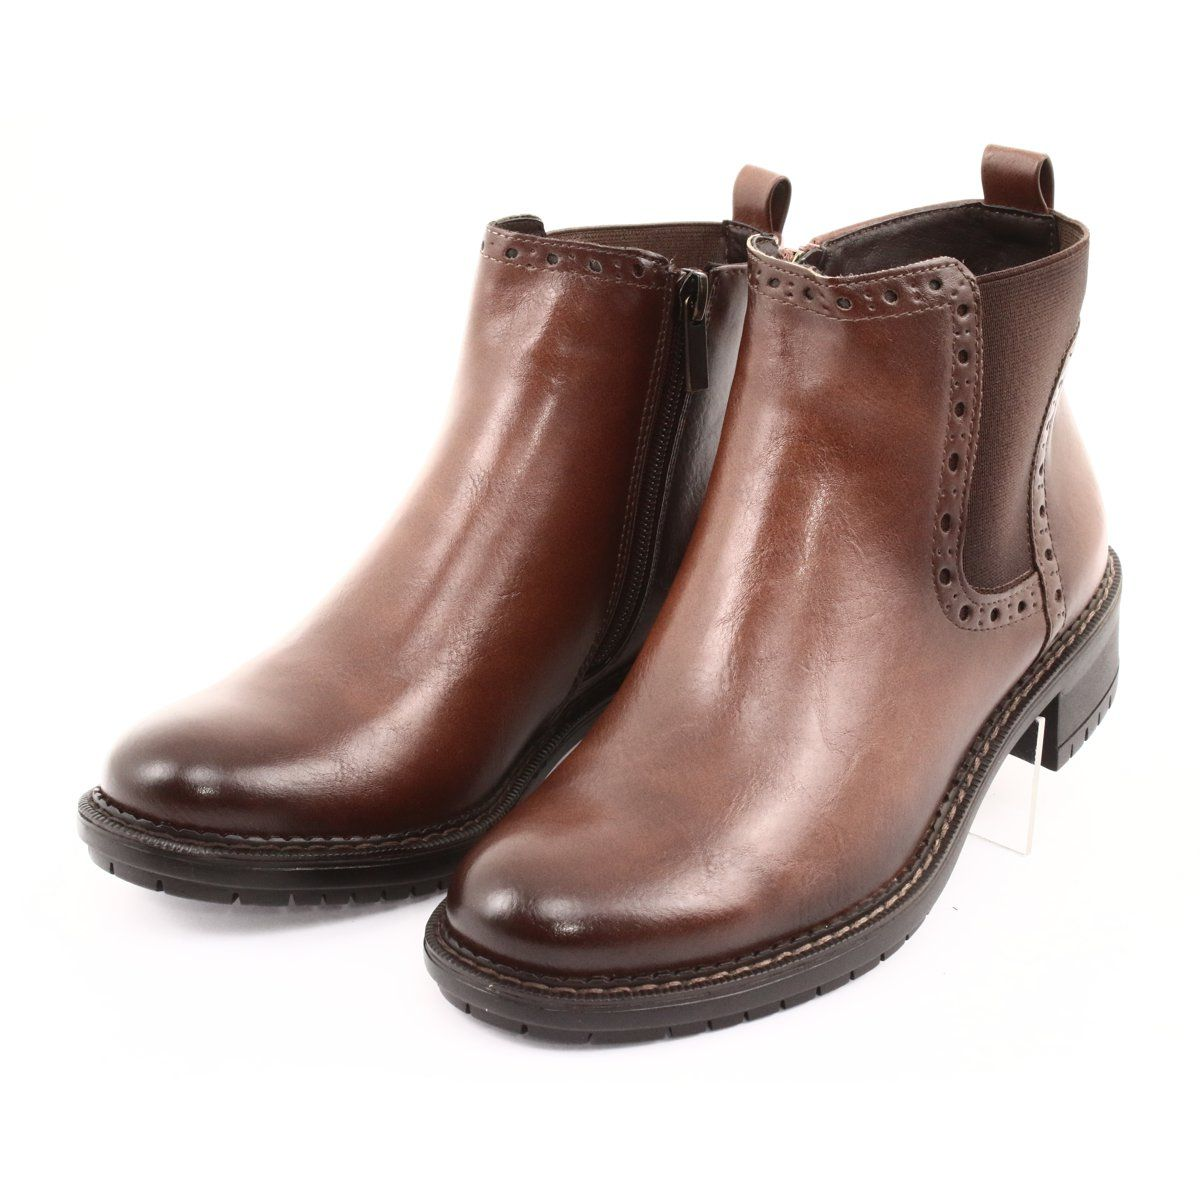 Botki Sztyblety Na Suwak Filippo 957 Brazowe Boots Jodhpur Boots Womens Boots Ankle